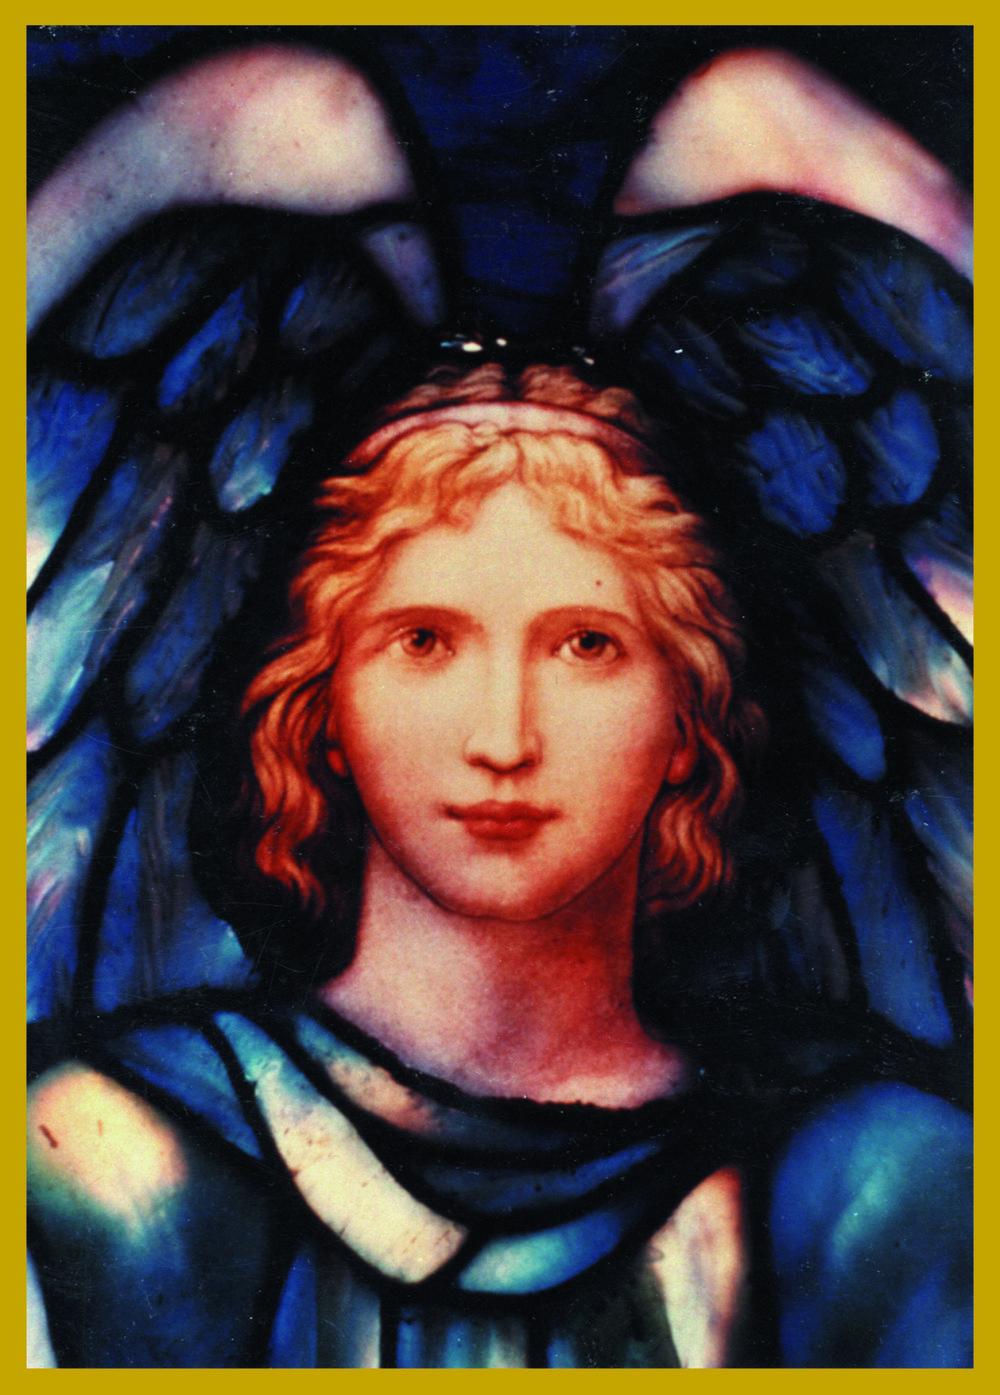 AR-RAPARCHANGEL RAPHAELANGEL OF HEALING - Raphael means